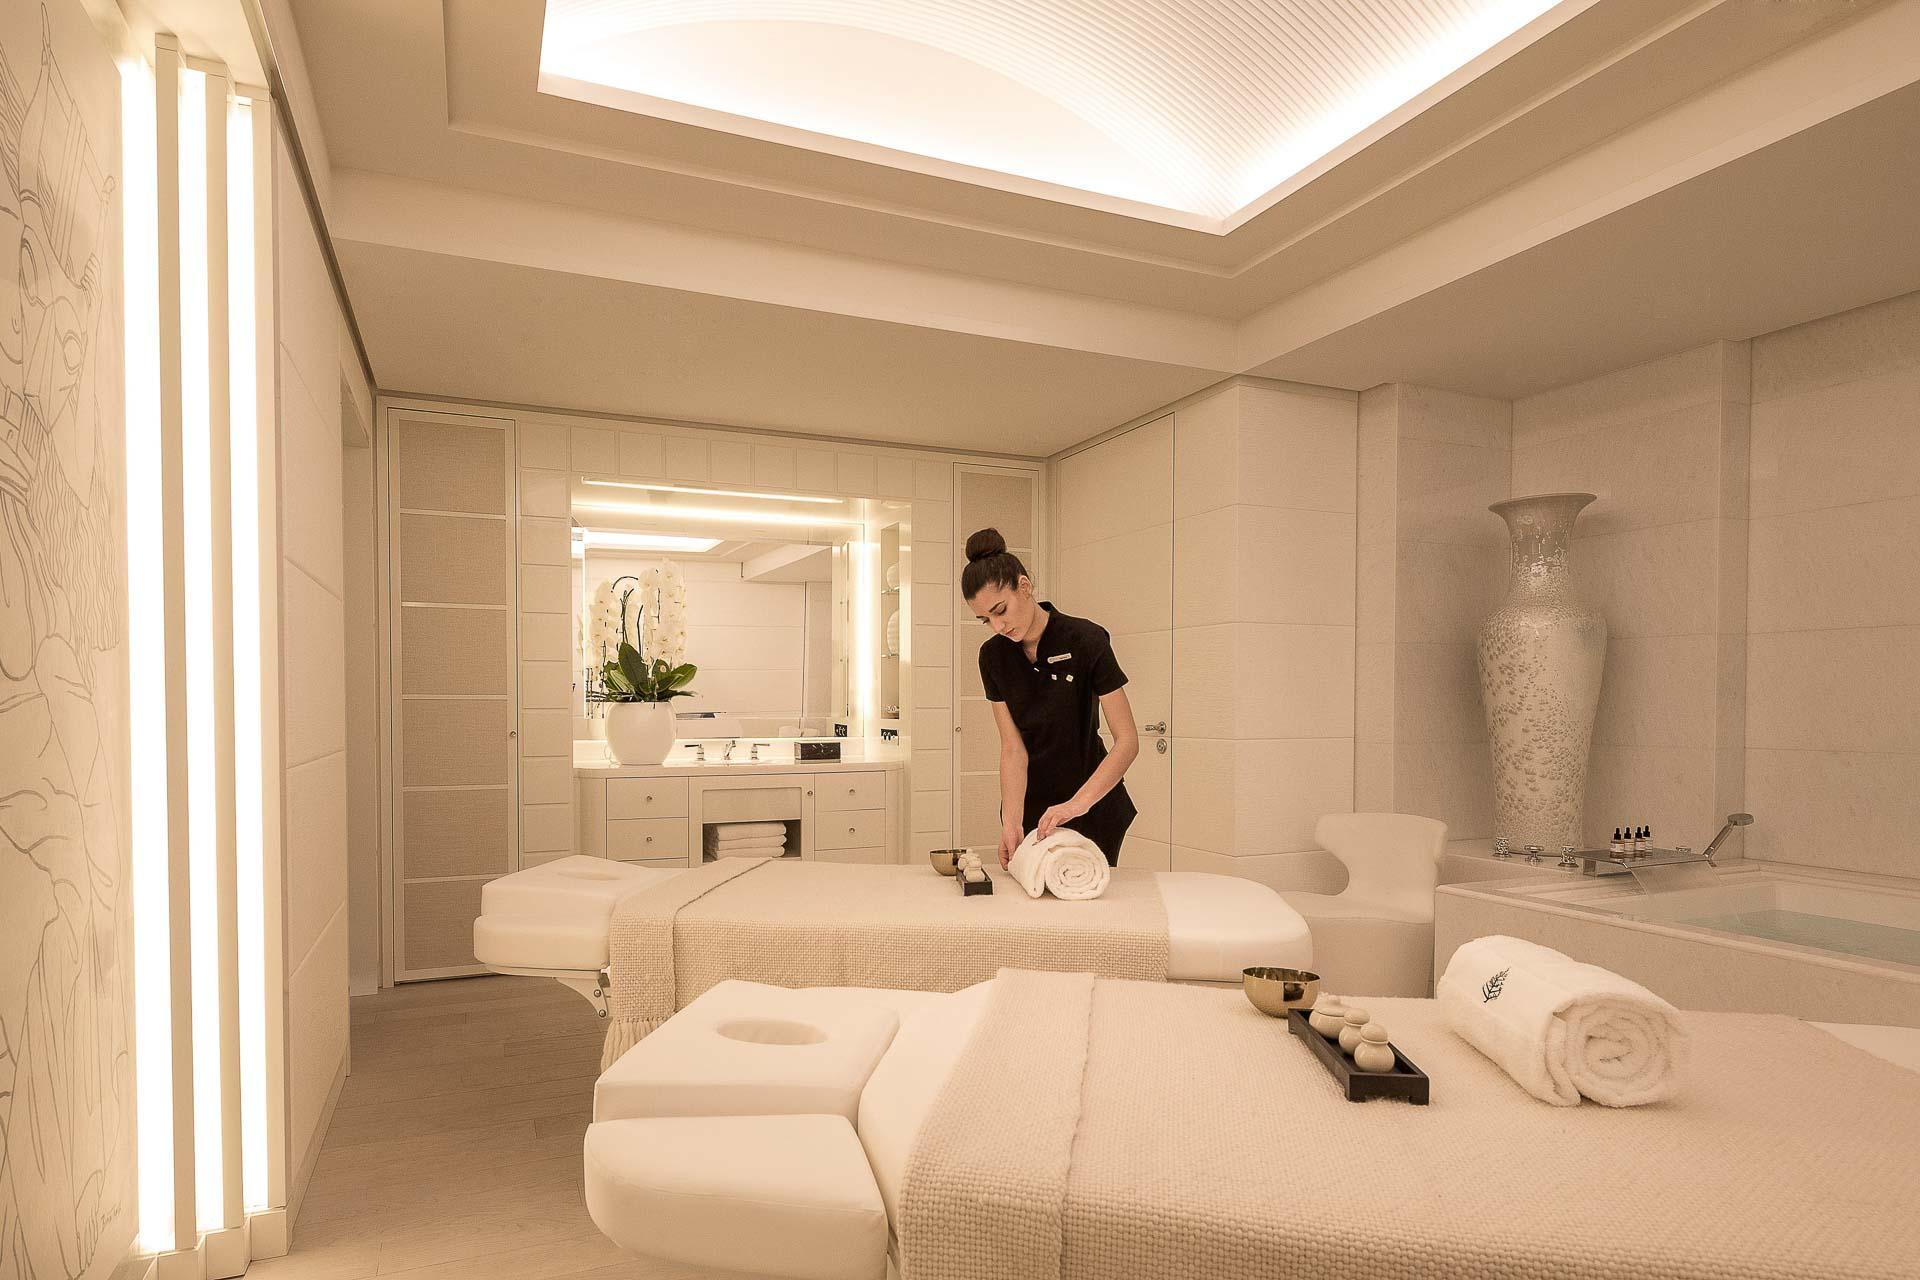 Four Seasons Hotel Megève - Spa - Cabine de soin double © Four Seasons